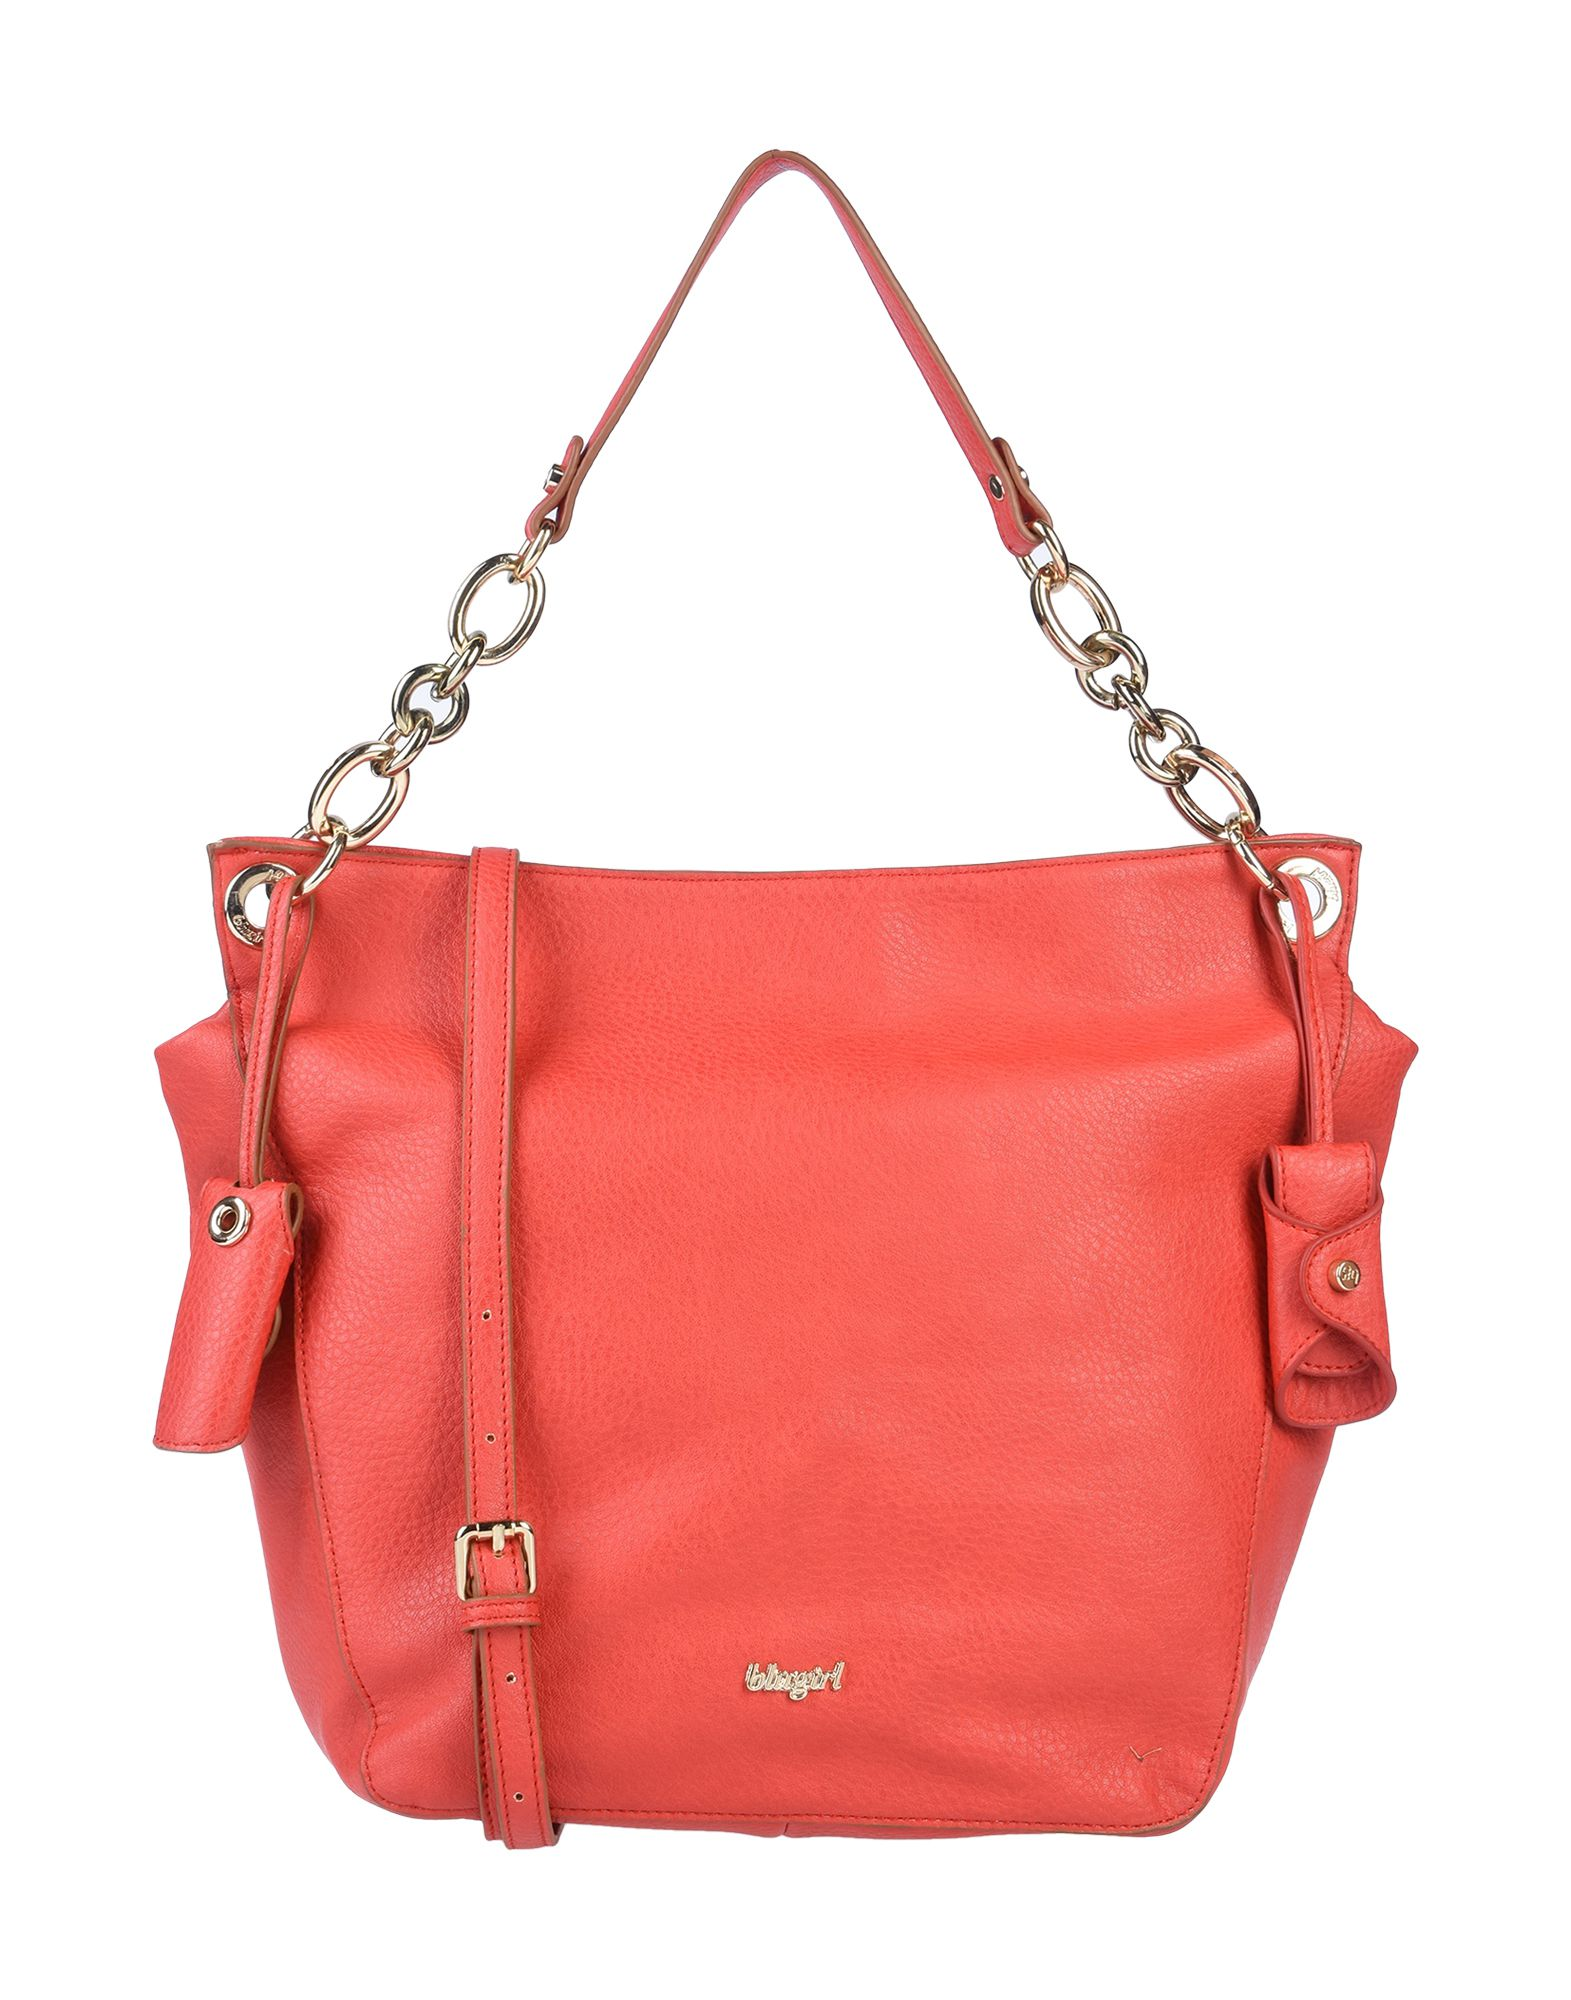 Фото - BLUGIRL BLUMARINE Сумка через плечо blugirl blumarine сумка через плечо